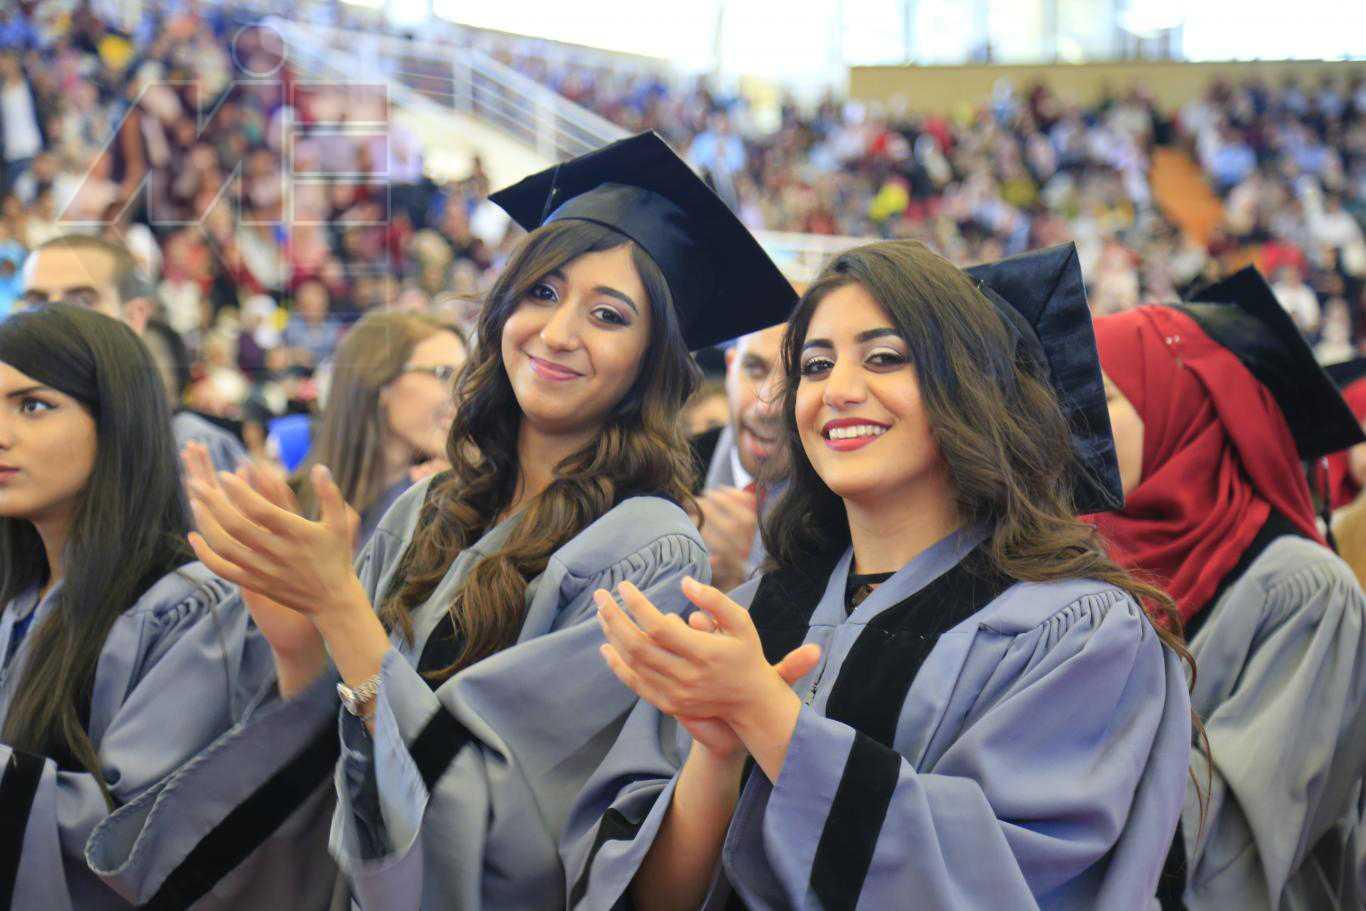 arab3 st تحصیل پزشکی در لیتوانی